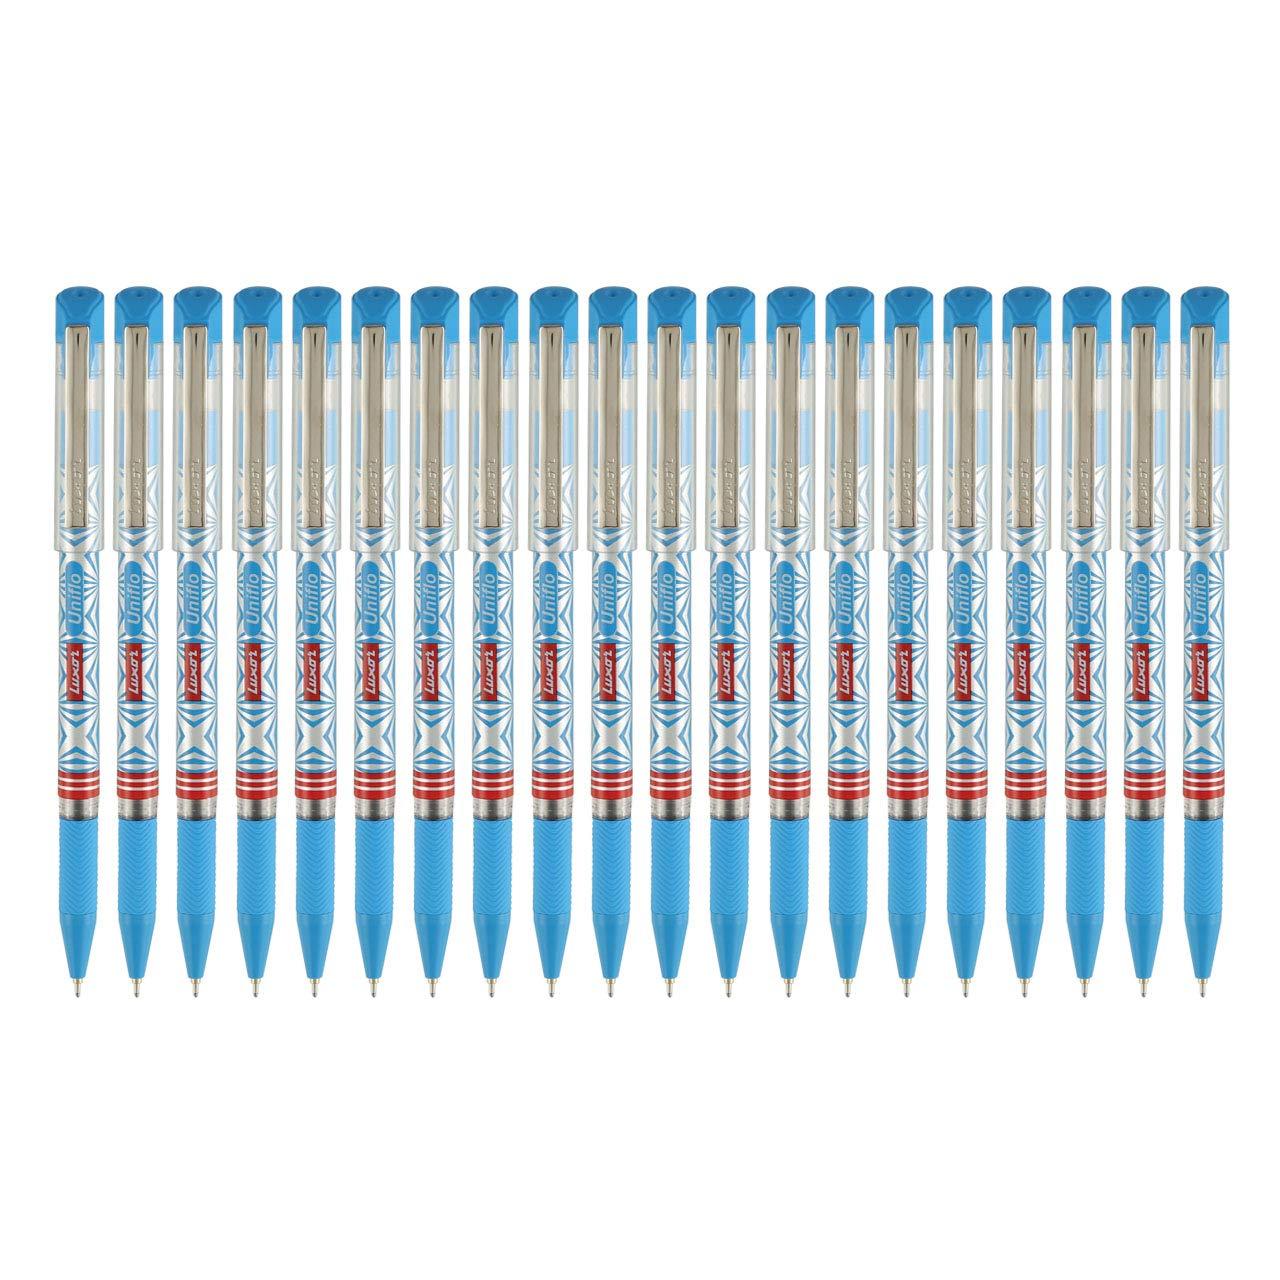 Luxor UNIFLO Ball Pen Blue (20's Box)